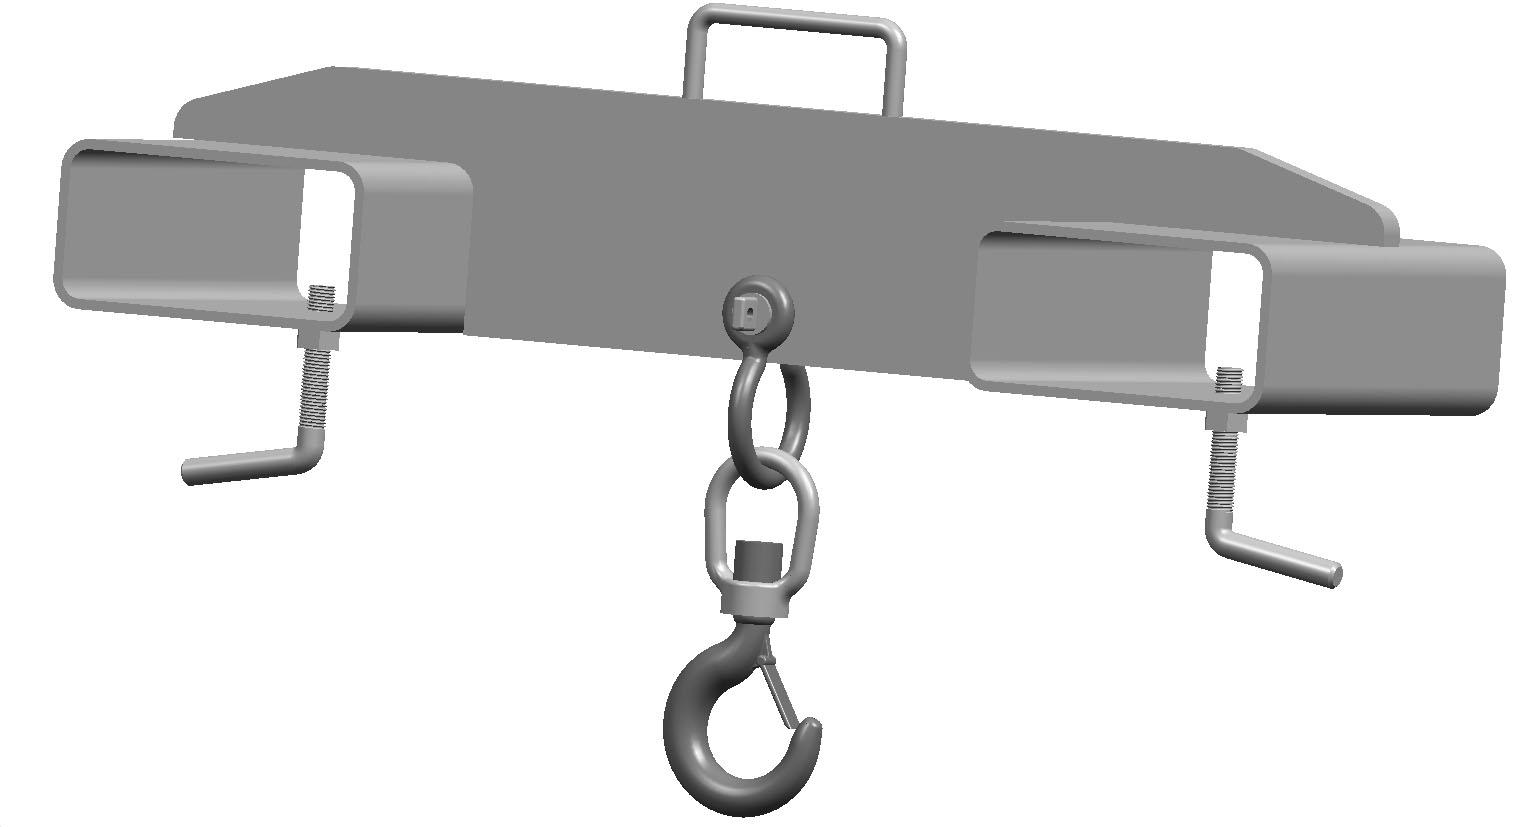 Forklift swivel lifting mounted hoisting hooks